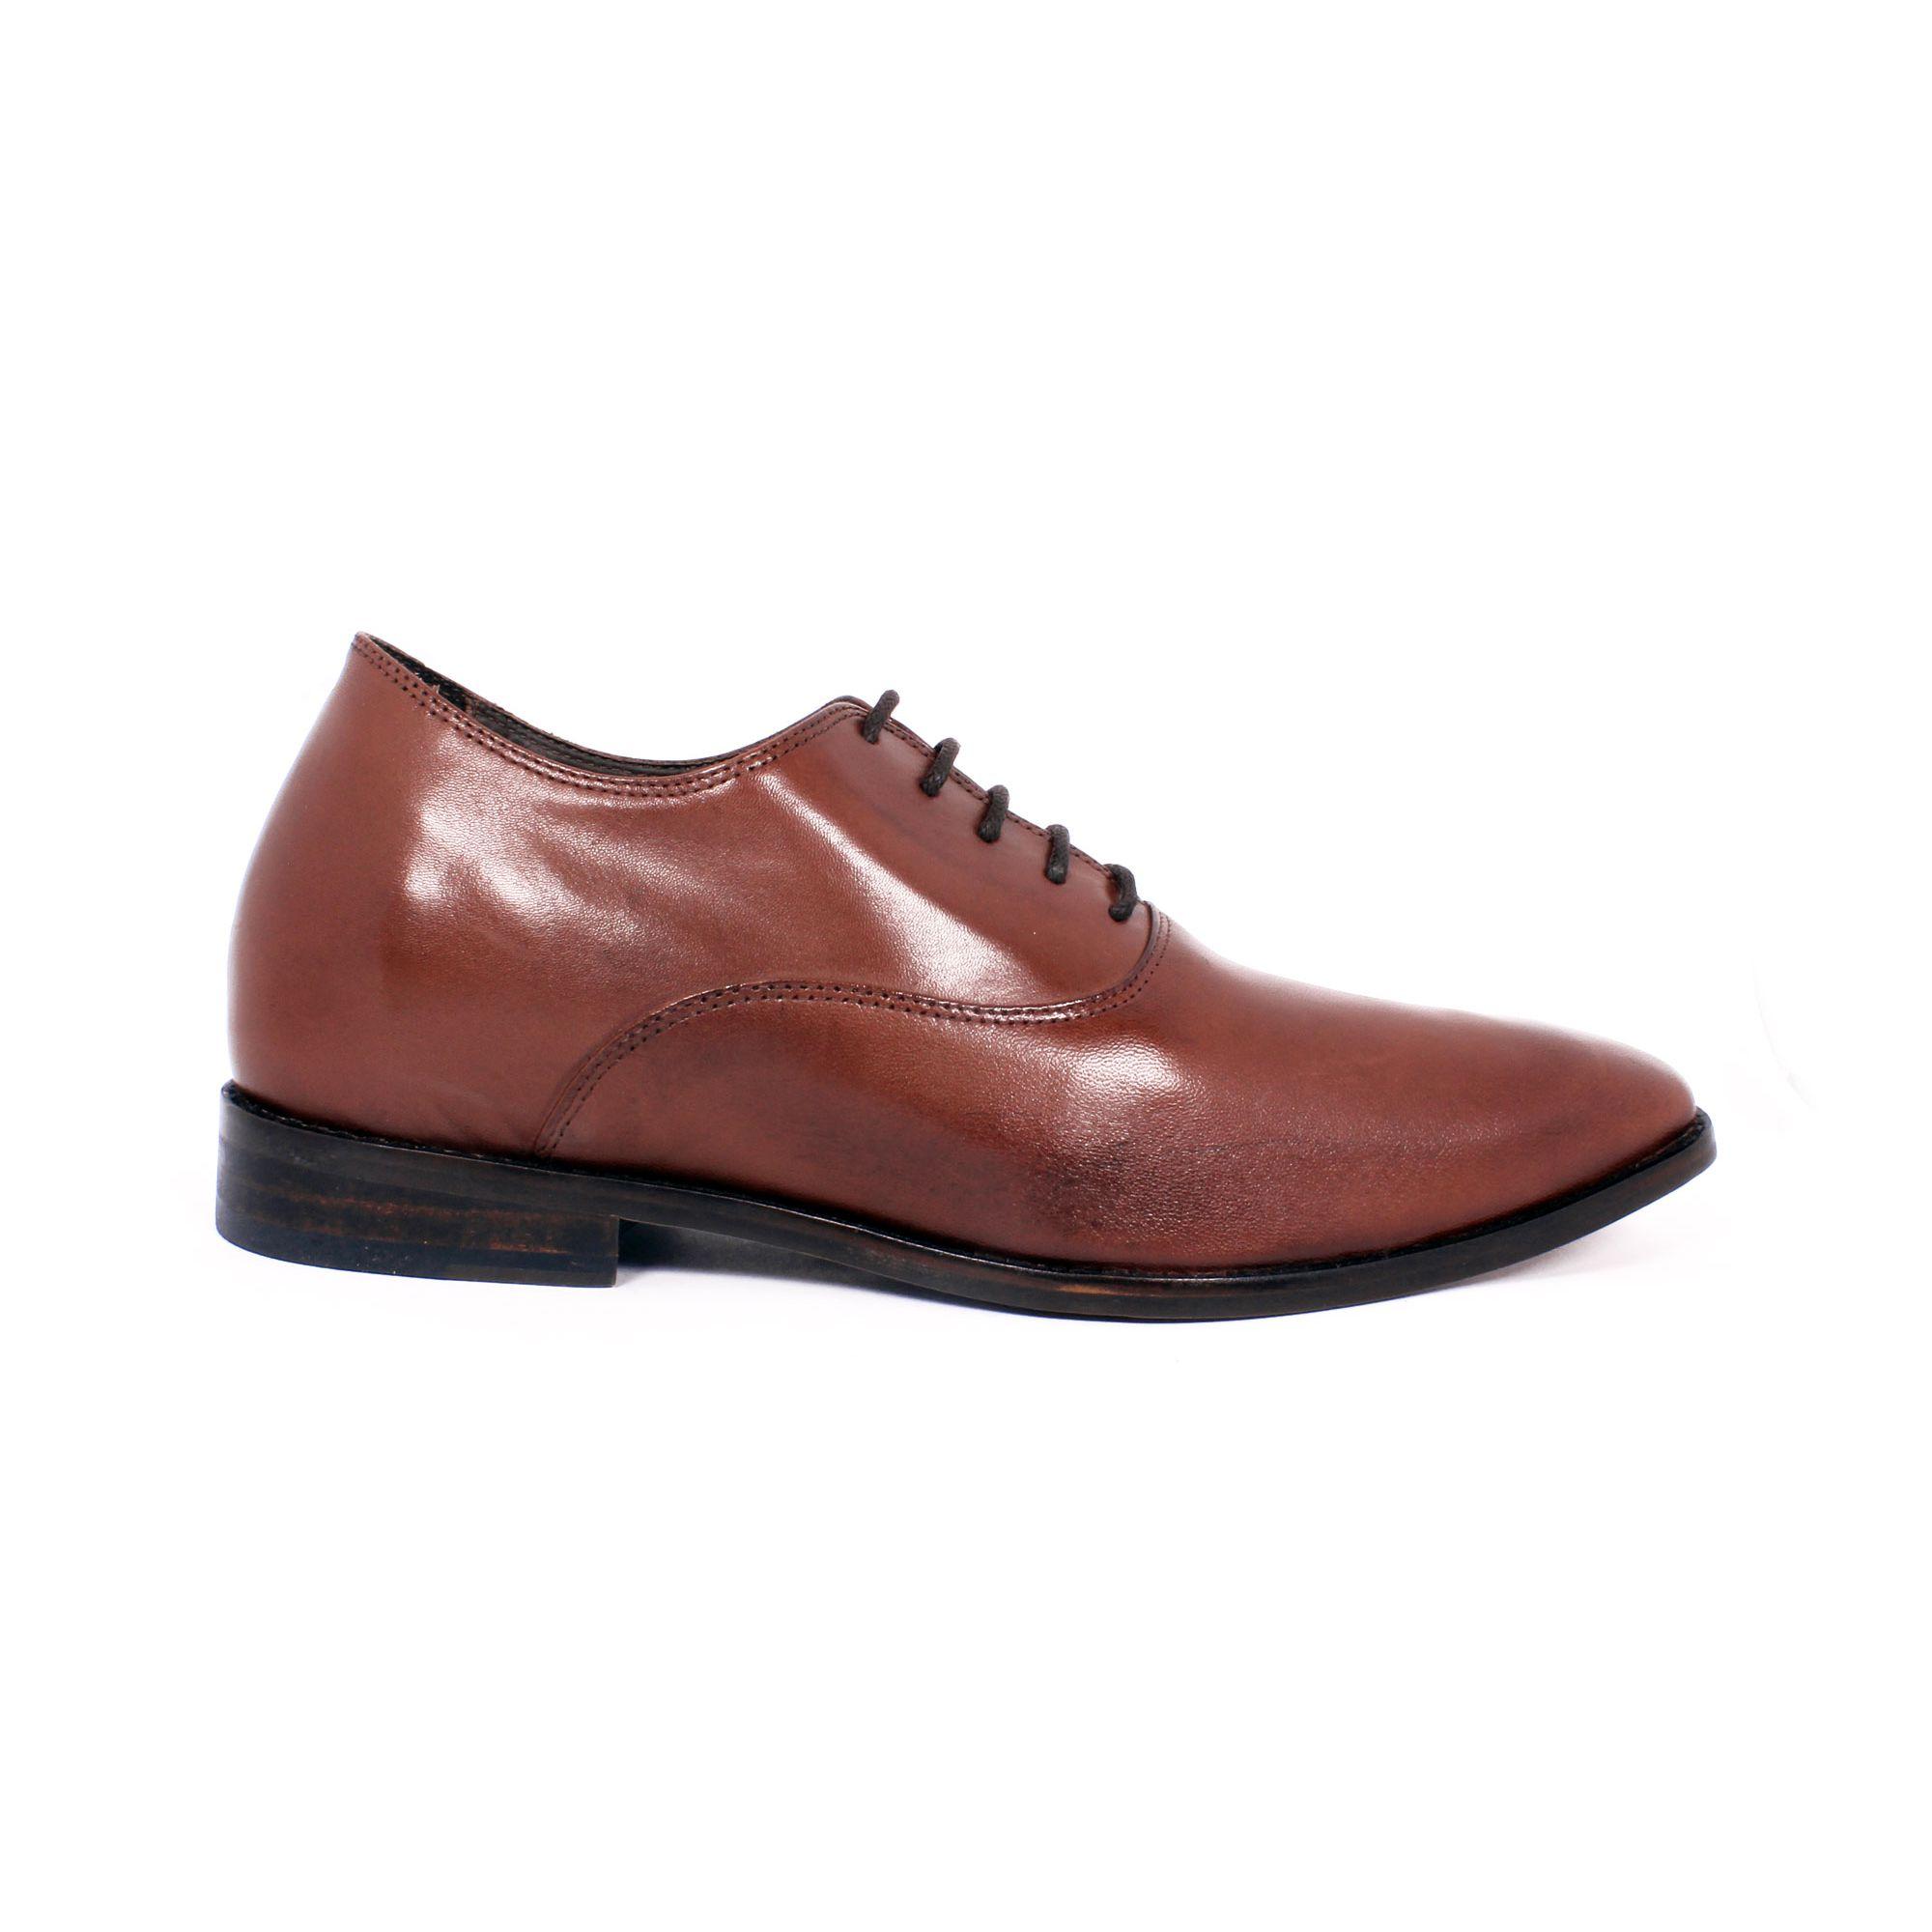 Zapato Formal Elegant Café Max Denegri +7cm de Altura_70805